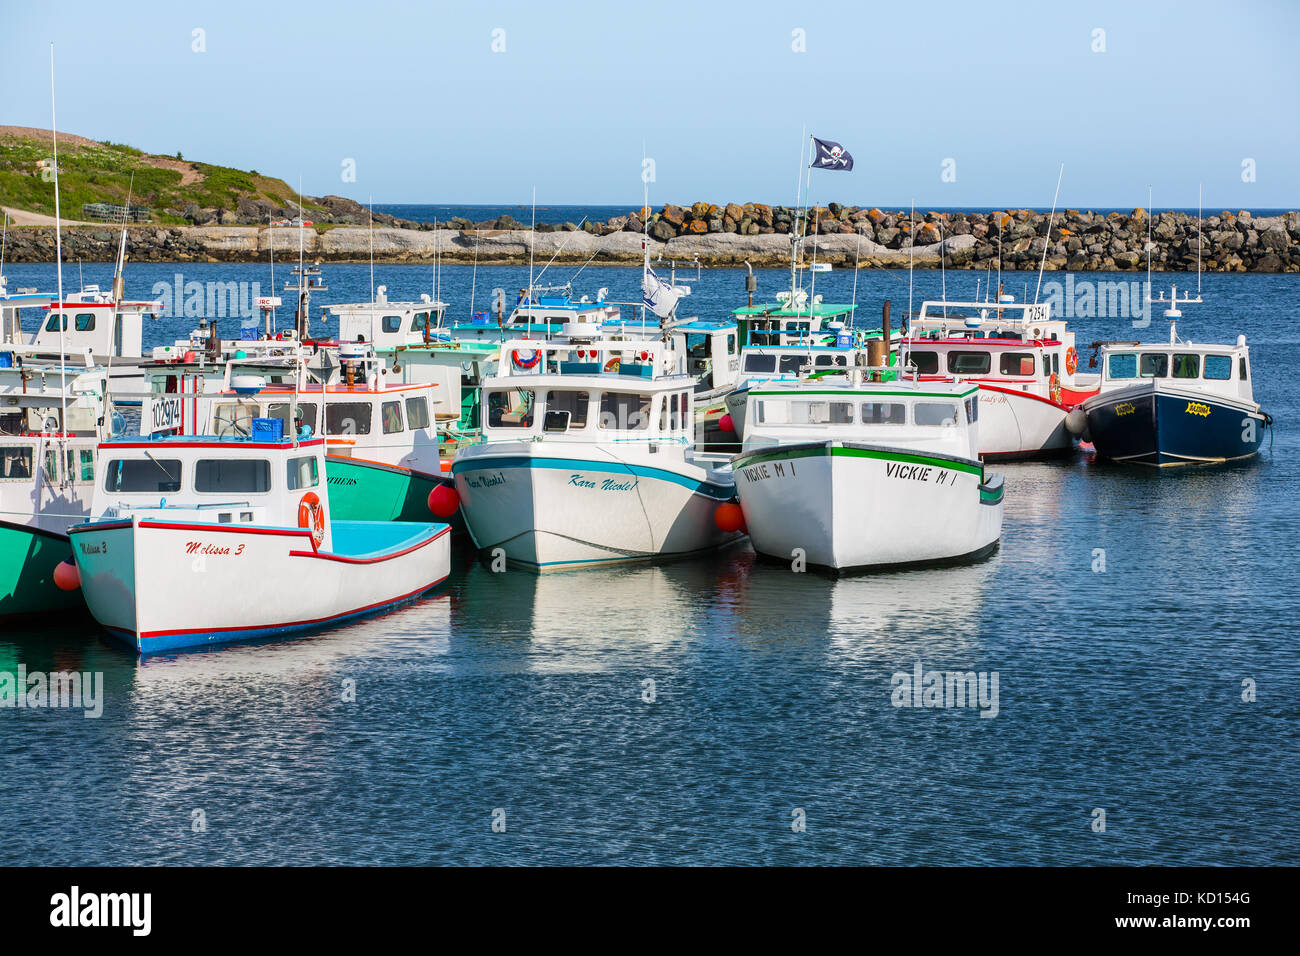 Fishing boats tied up at wharf, Main-A-Dieu, Cape Breton, Nova Scotia, Canada - Stock Image